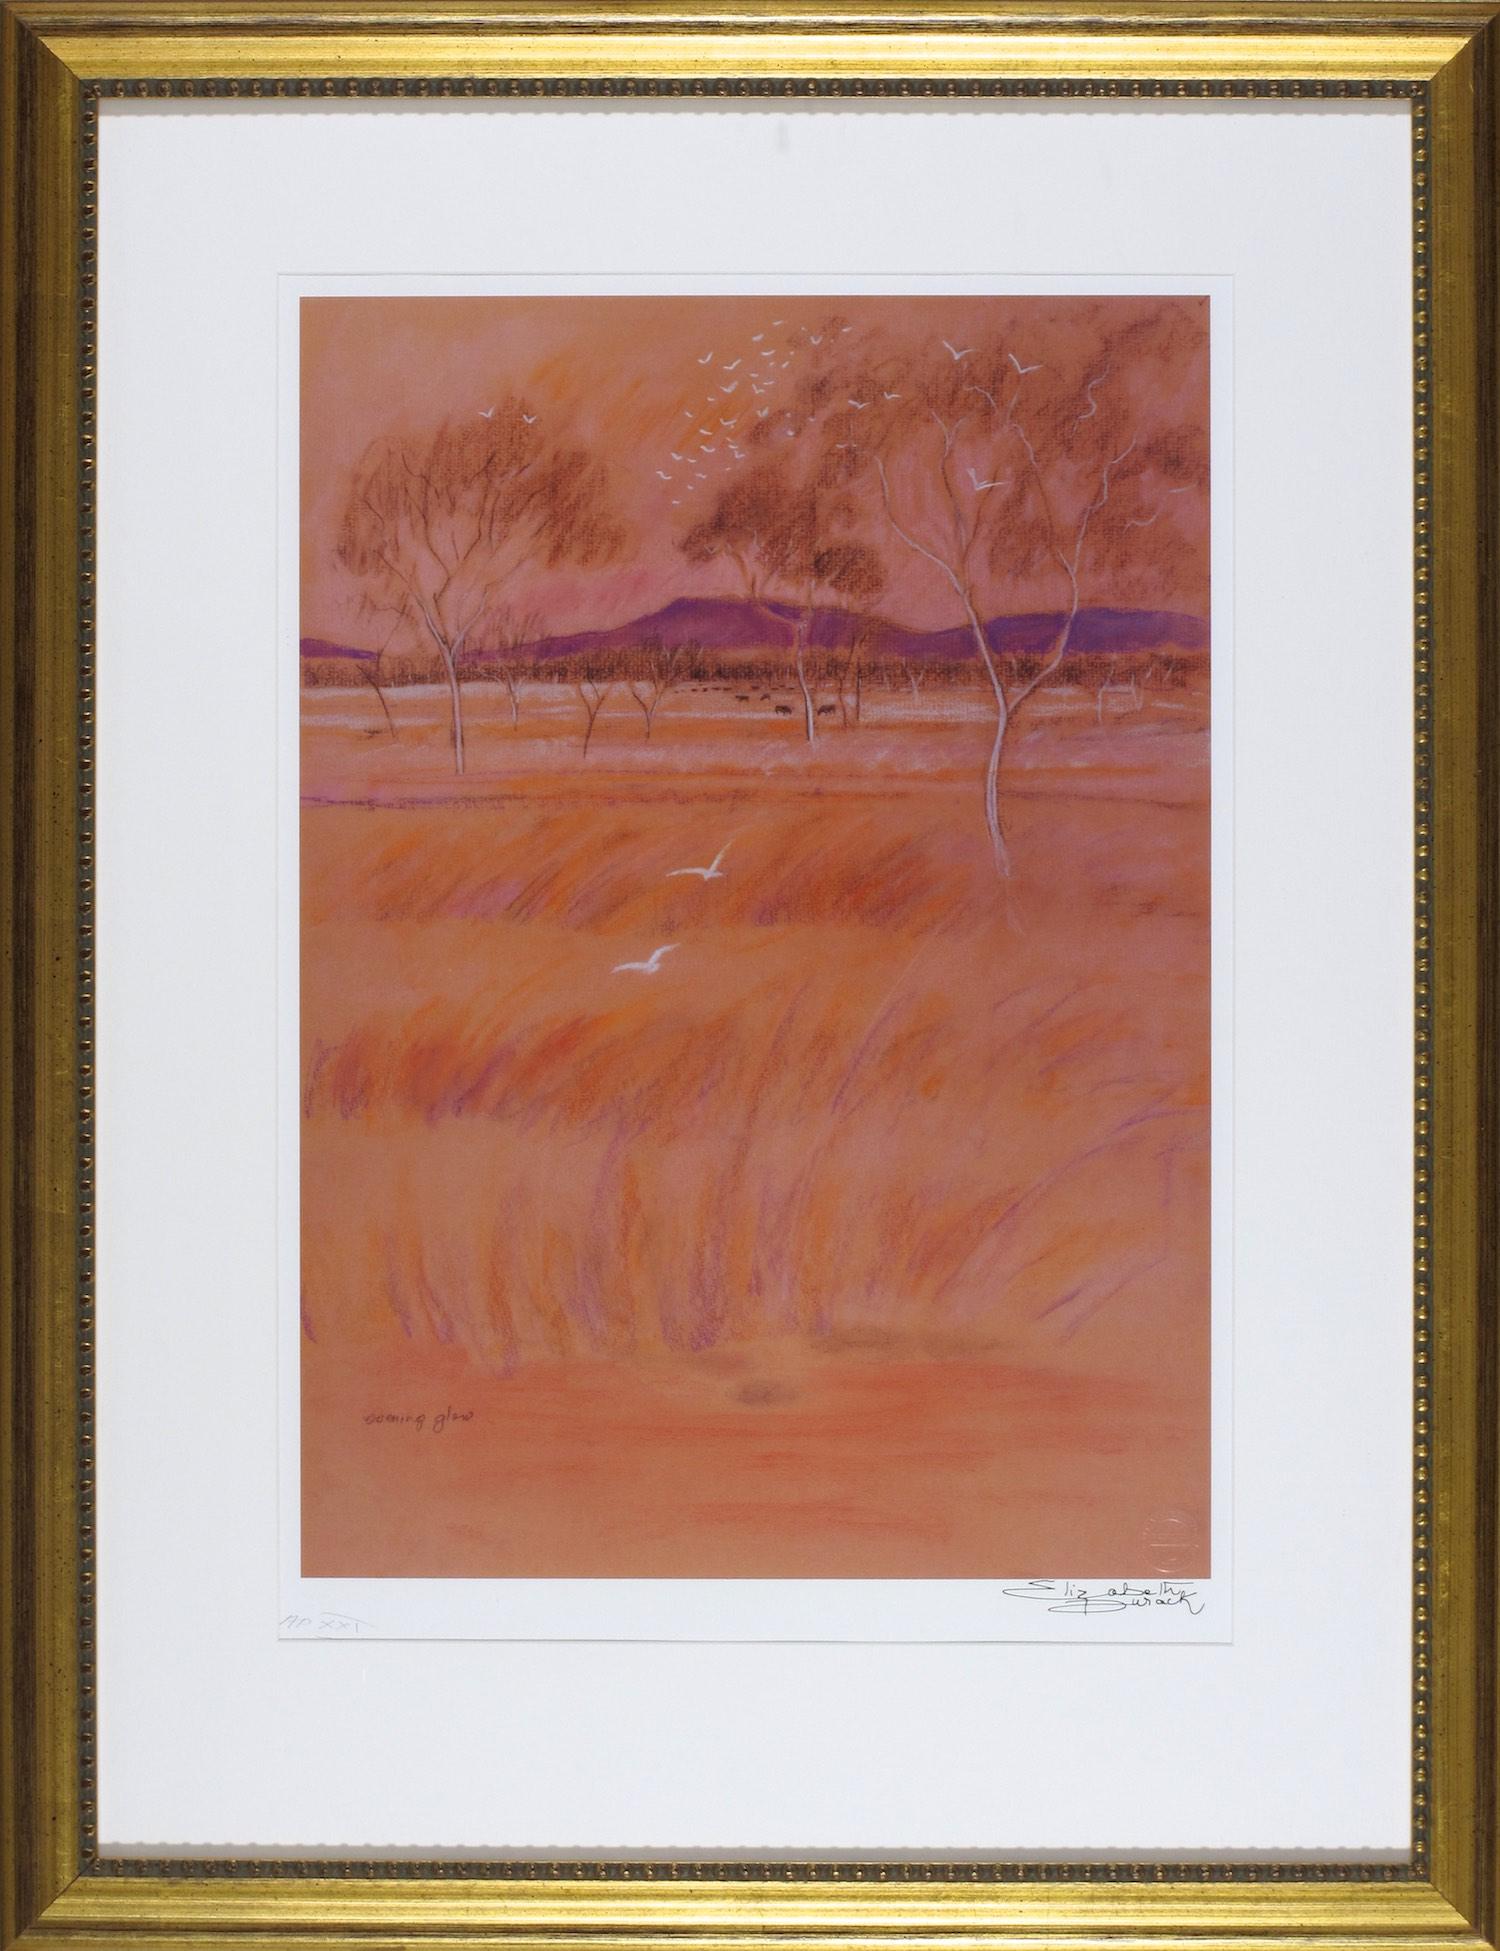 #12916 ED13. Elizabeth Durack. Evening Glow. Signed AP 21. 86cm x 66cm.